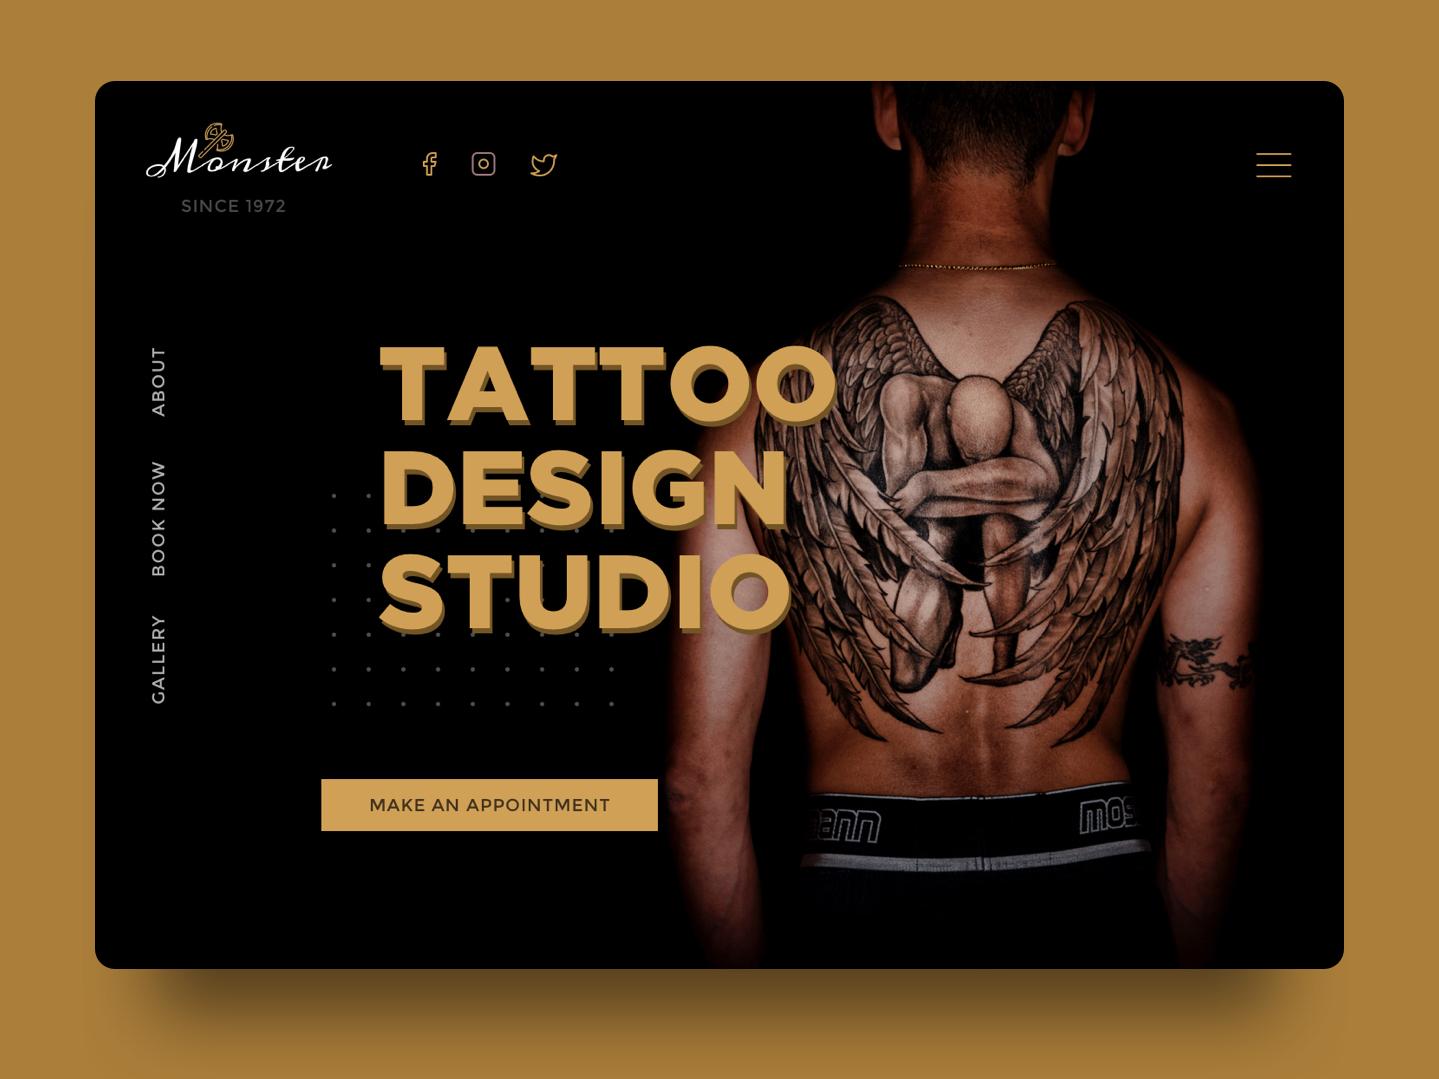 337a98daa Monster Tattoo Studio by Bansal on Dribbble